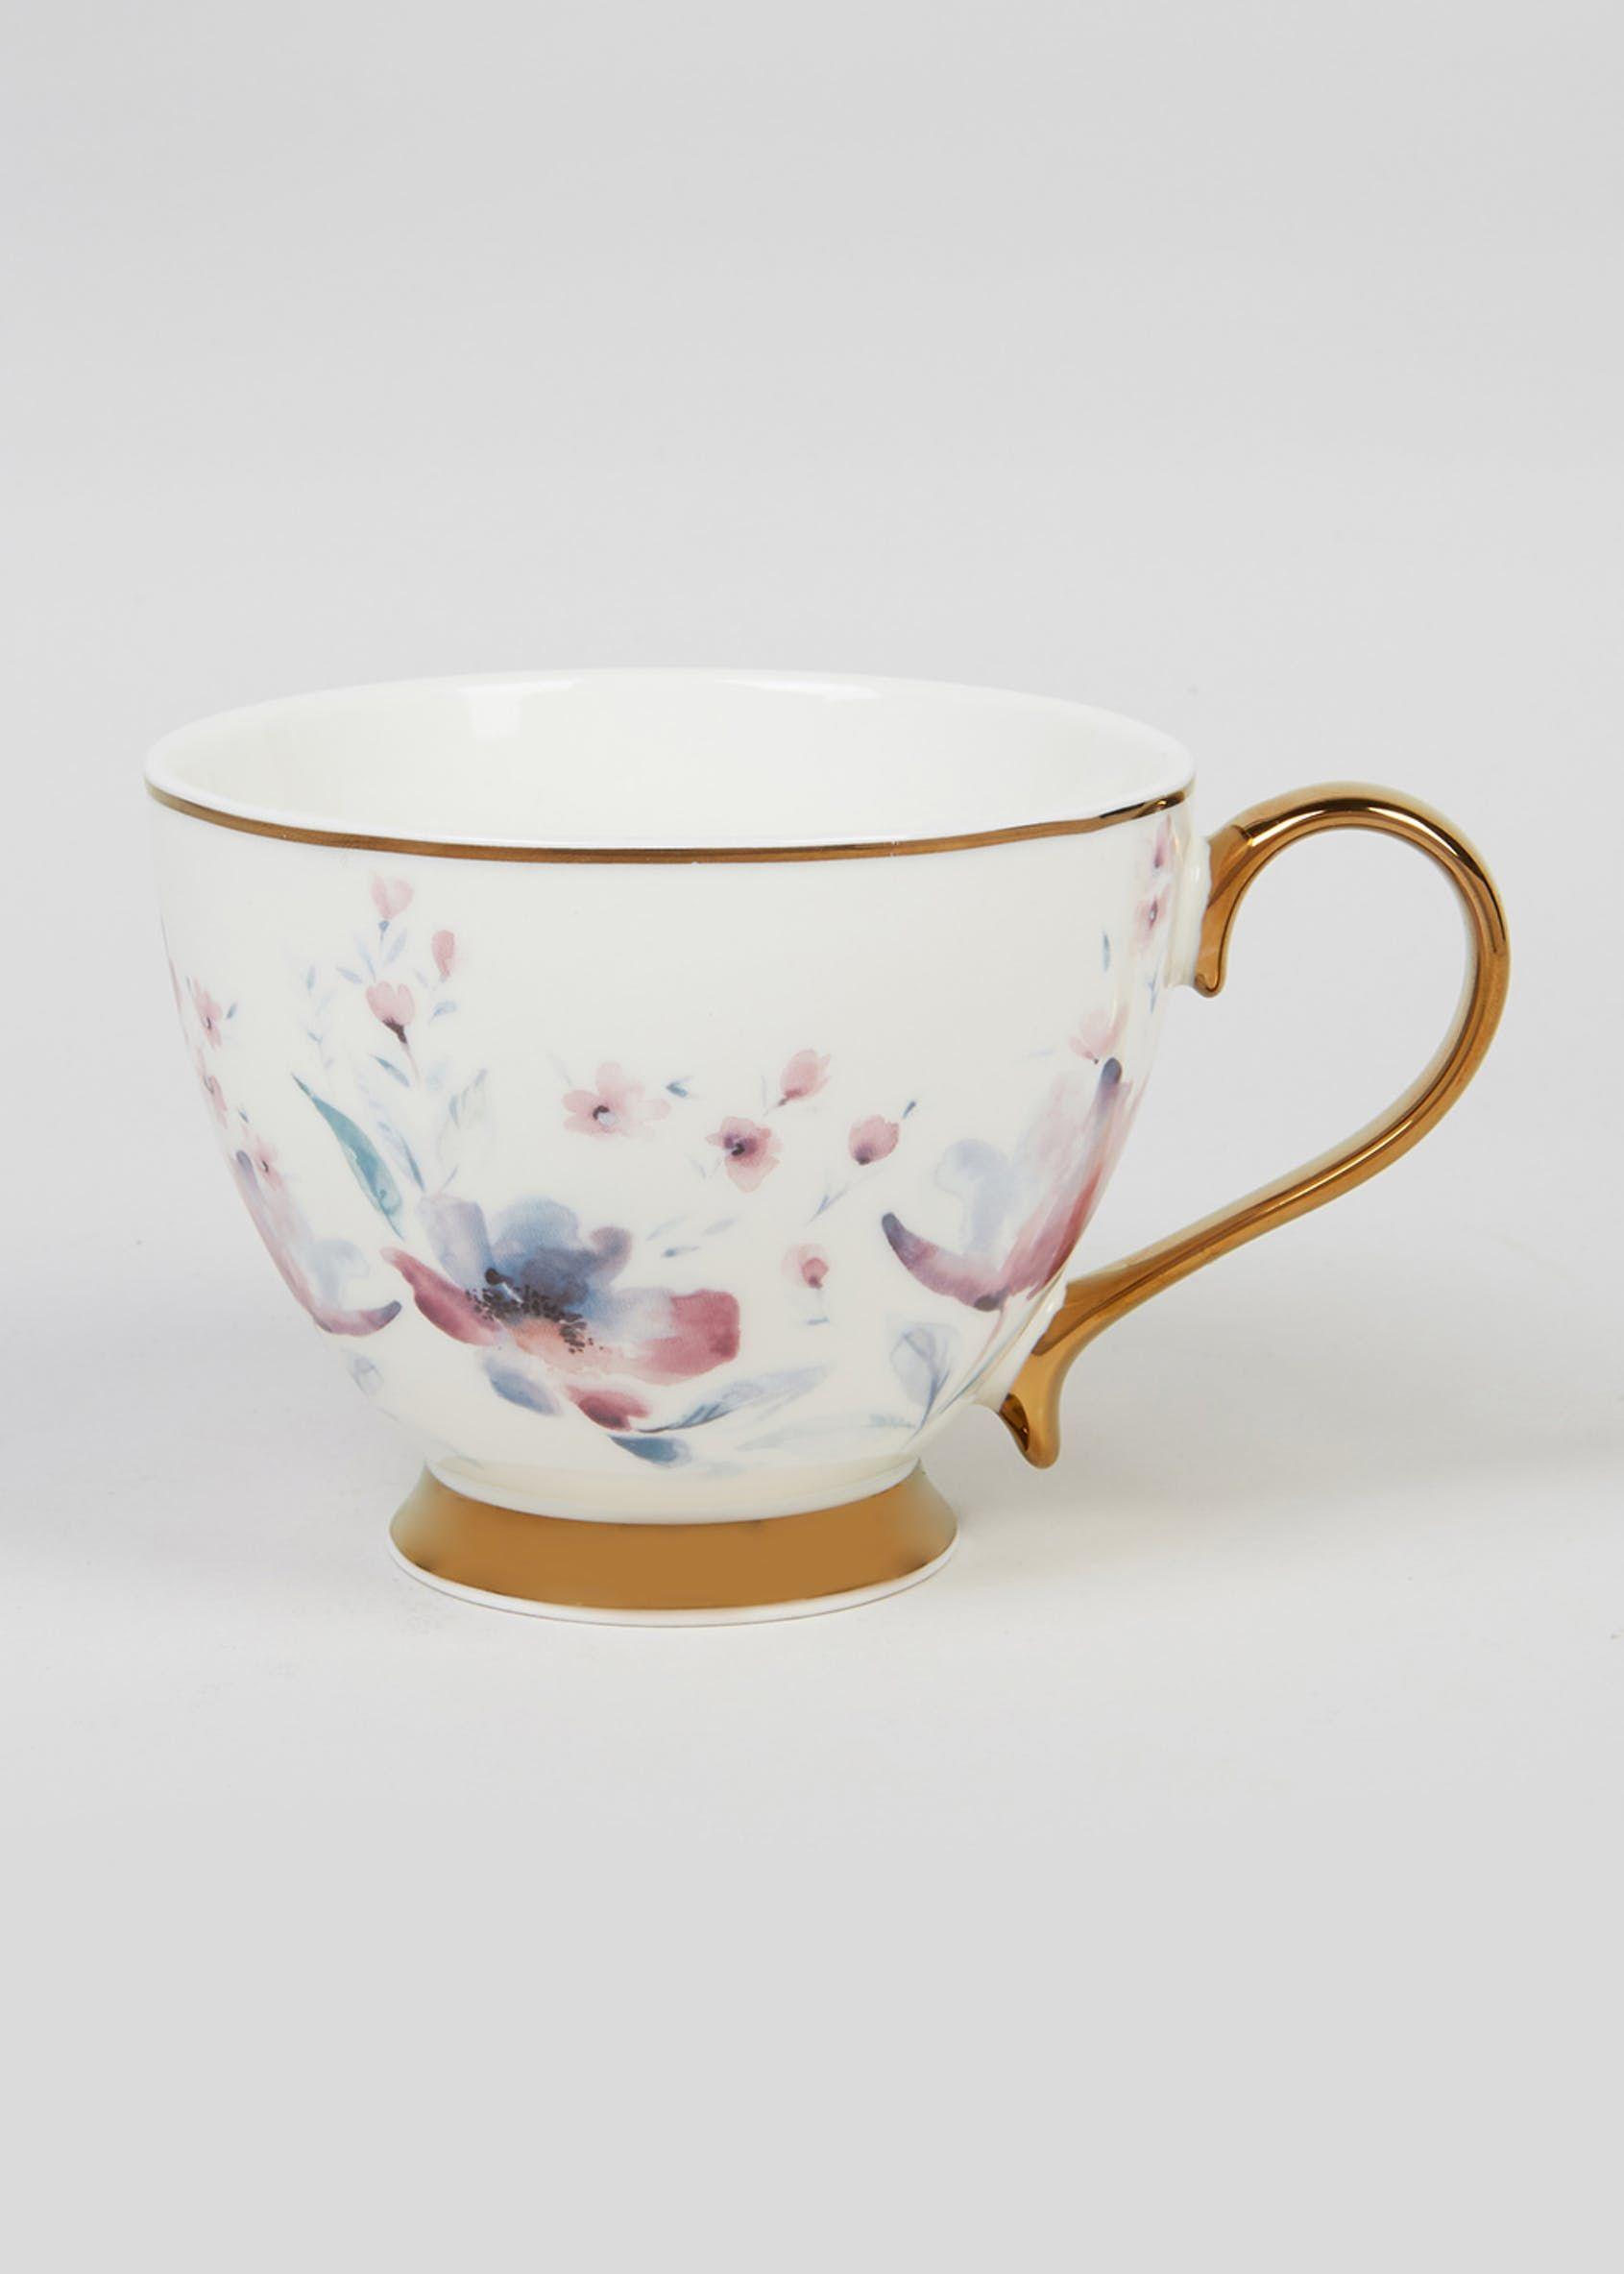 Romantic Rose Mug Bone China Flowers Vtg Chintz Hot Drinks Coffee Tea Cup